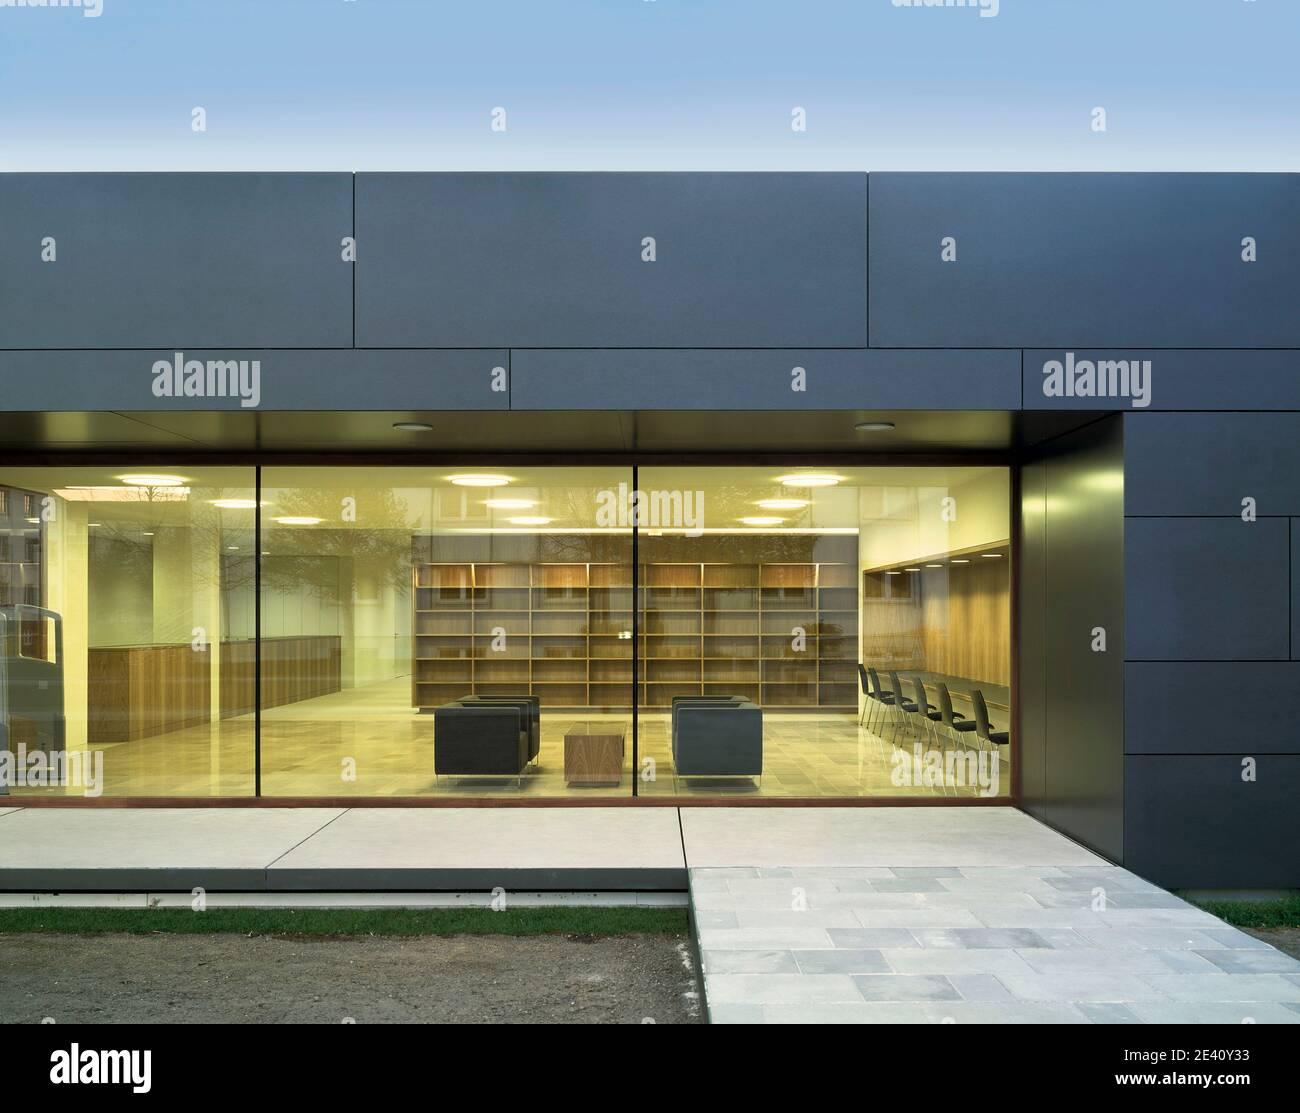 Bibliothek FSHV Meissen, sachsen, sajonia, Sachsen, Sajonia, europa, Europa, Europa, bibliothek, biblioteca, biblioteca, biblioteca, arquitecto: dd1 Archit Foto de stock